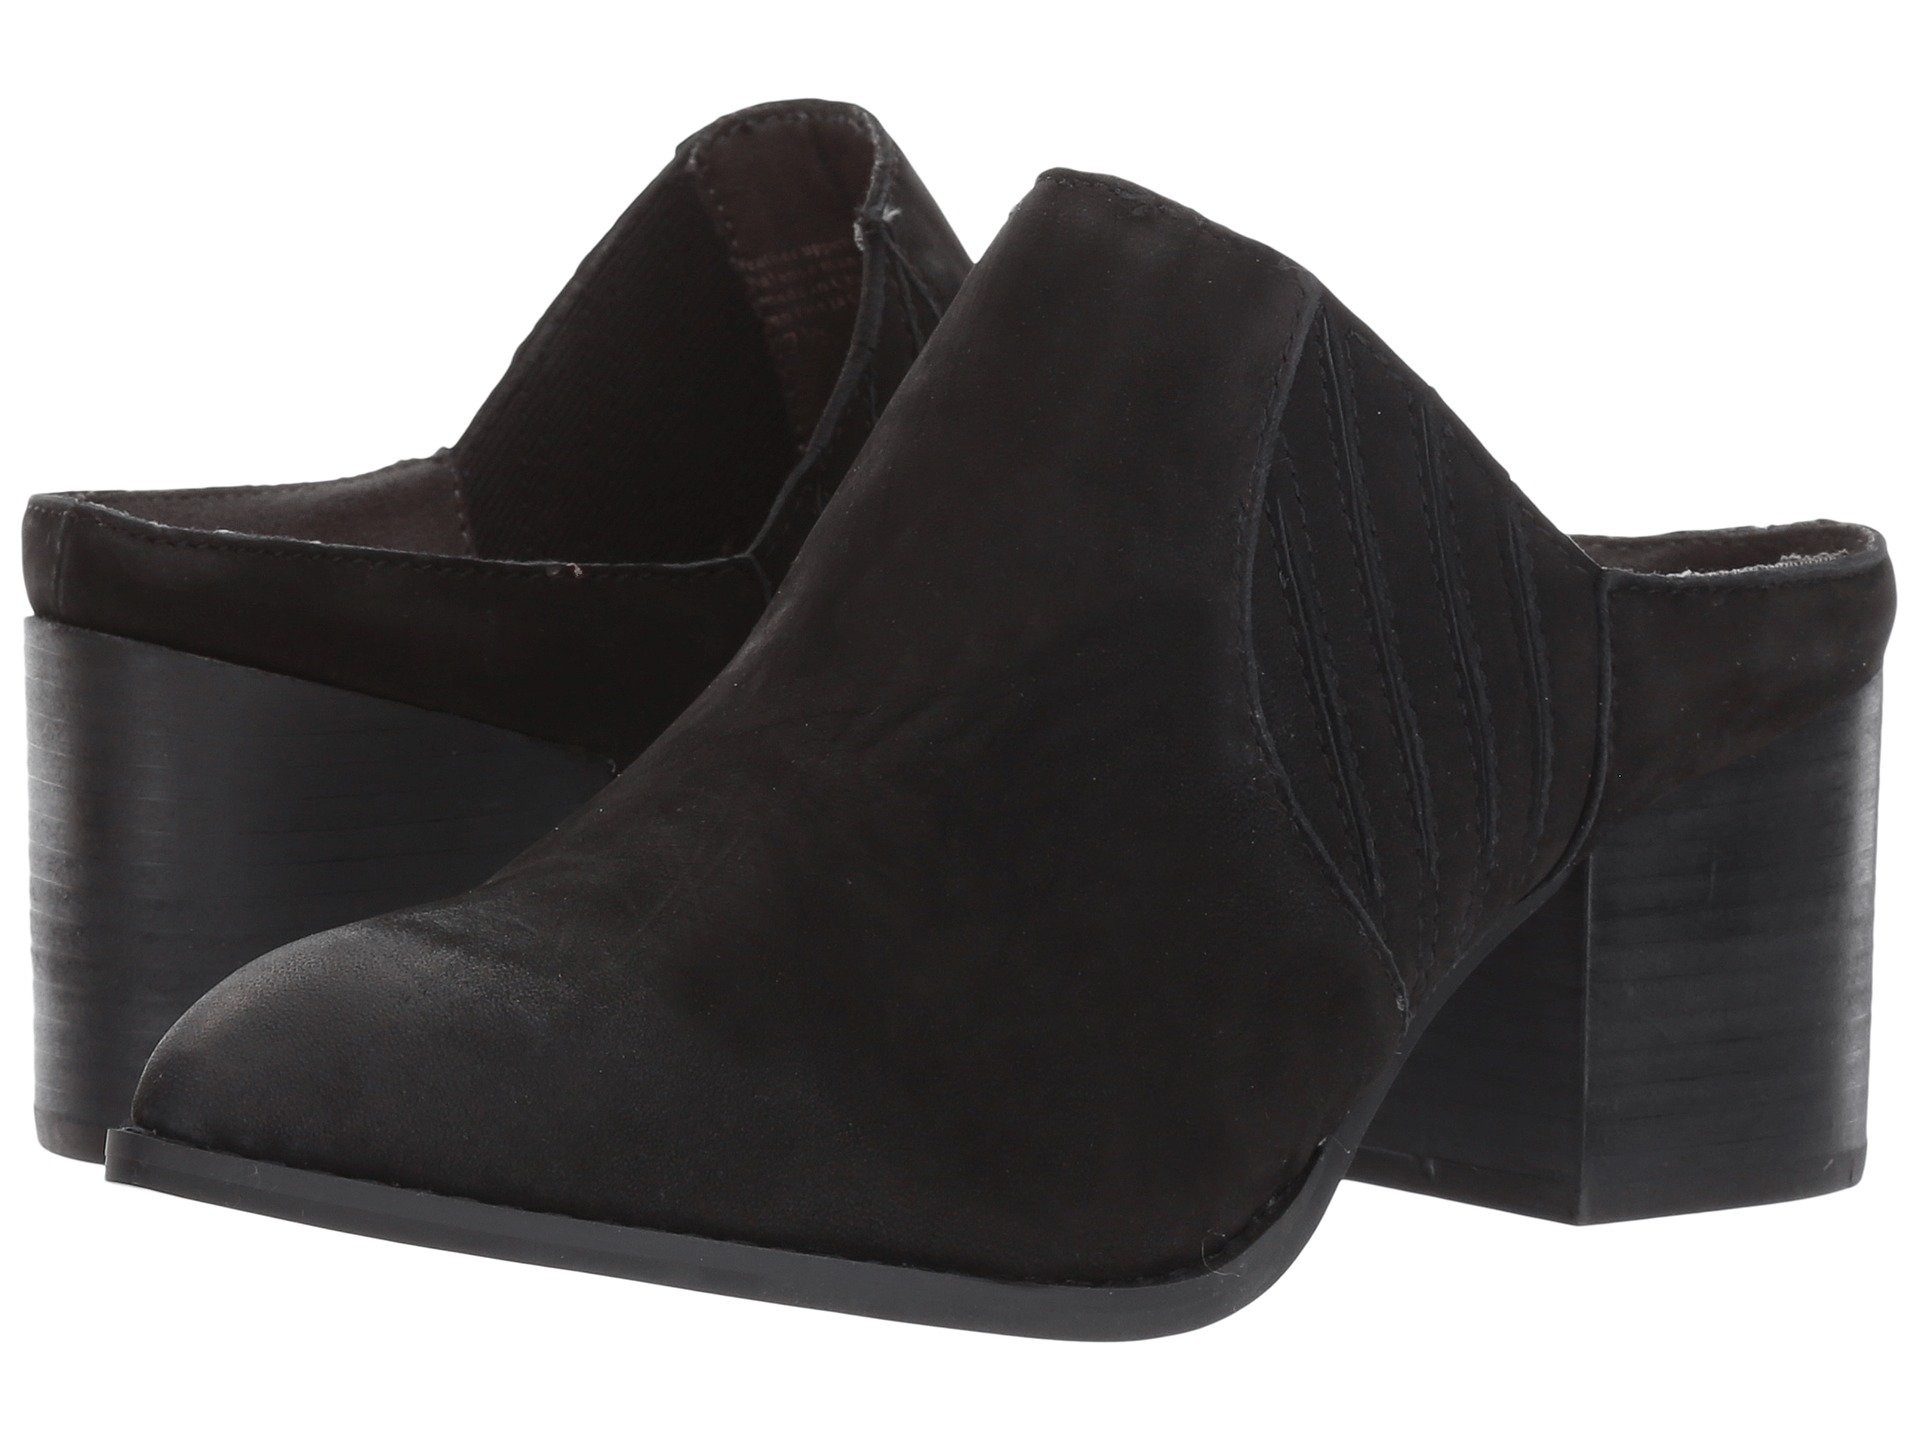 New Seychelles Dialogue Women's Slide Shoes, Black Nubuck